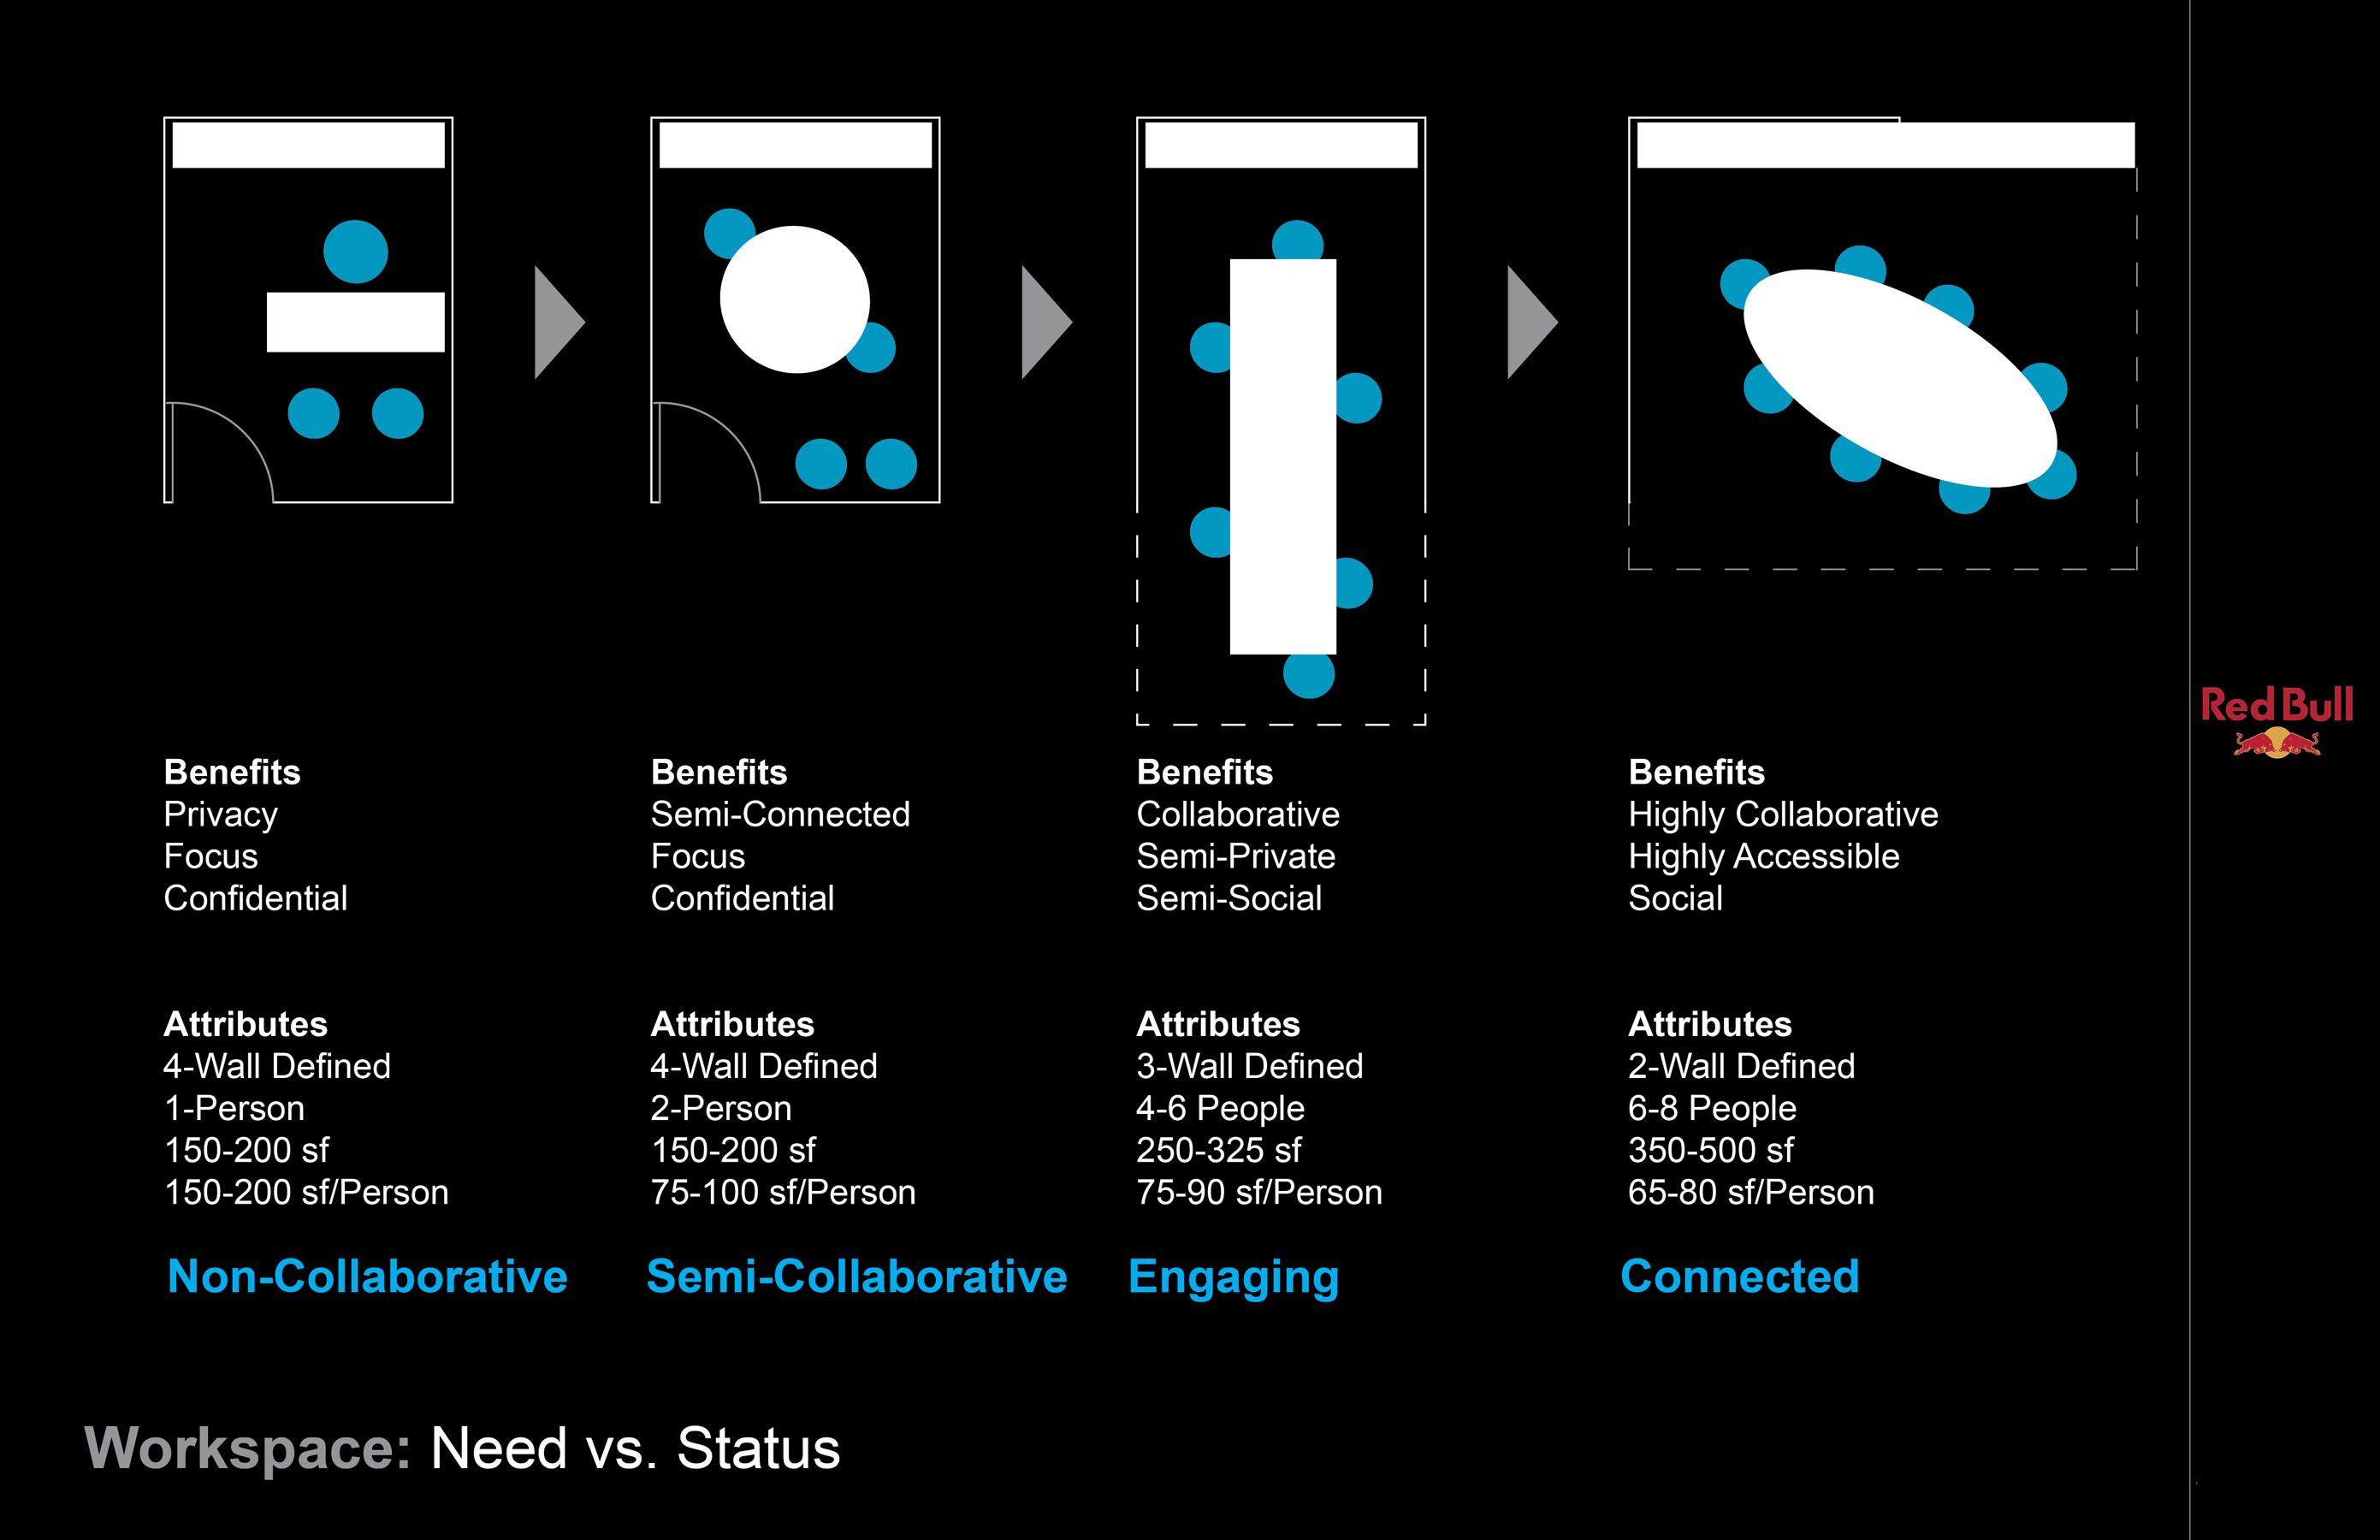 3 Red Bull Headquarters North America open studio architecture OSA - need versus status diagram